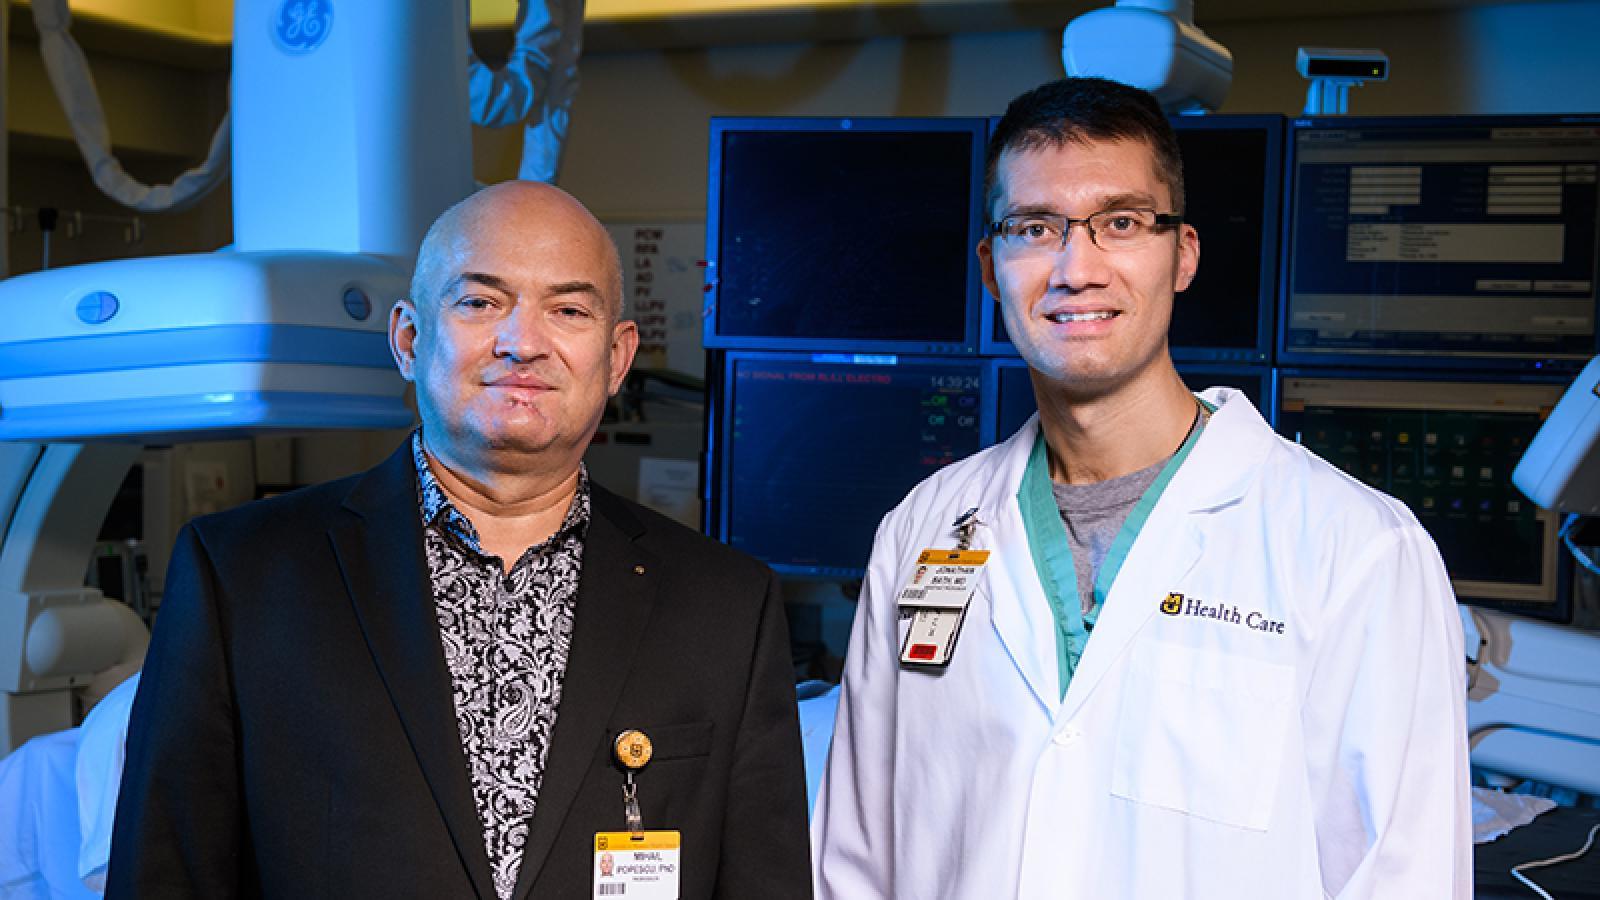 Jonathan Bath, MD and Mihail Popescu, PhD